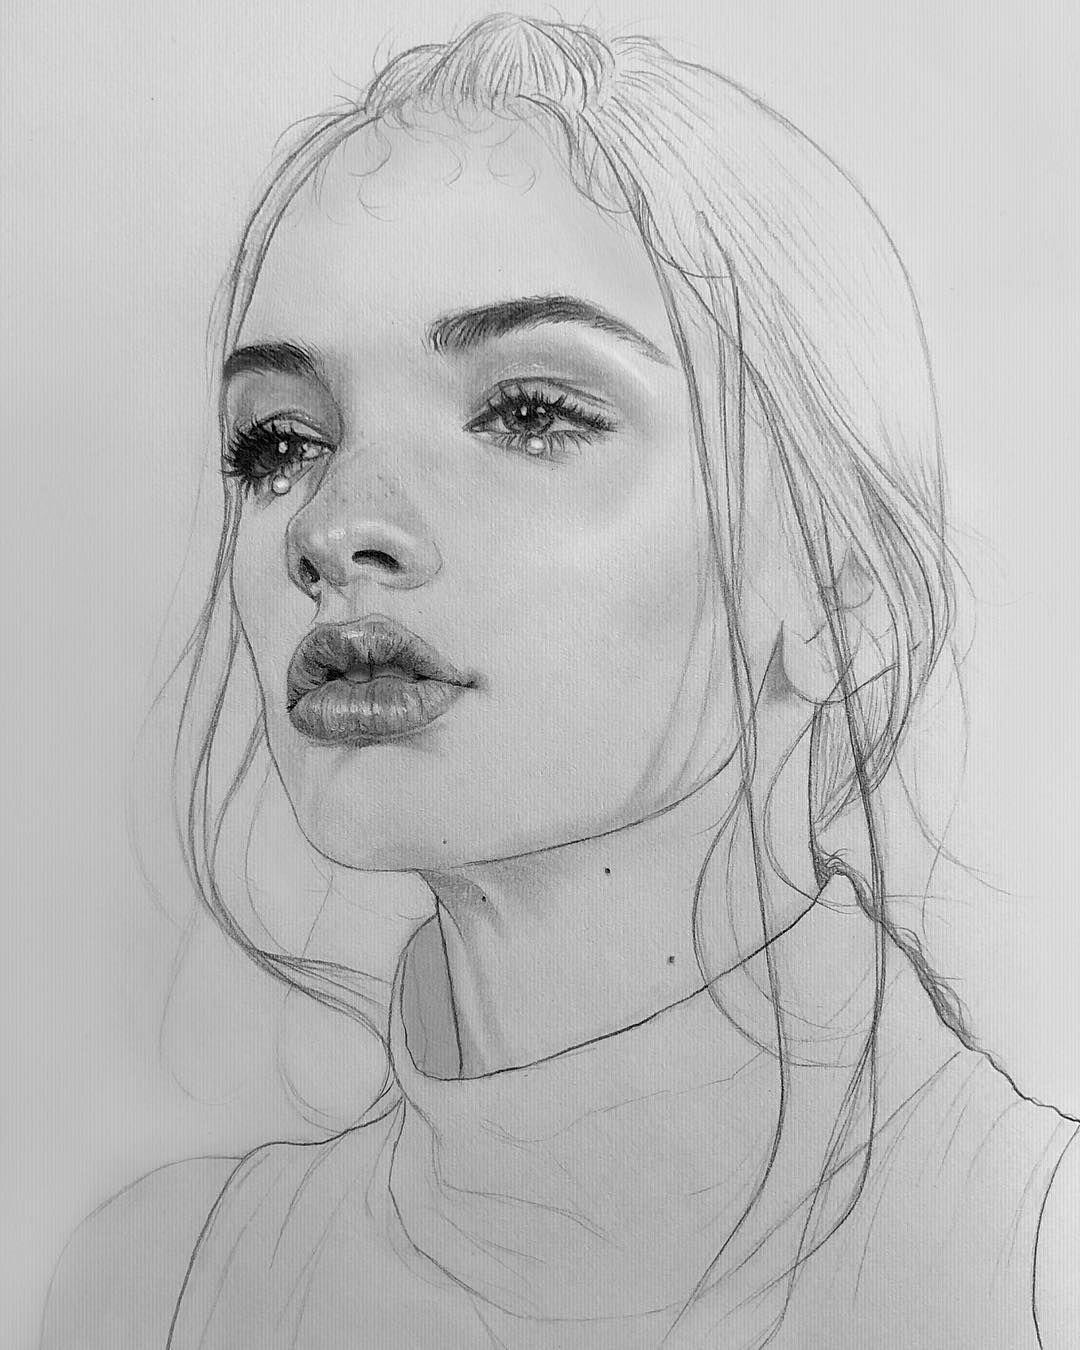 Instagram sketch by jeremybear